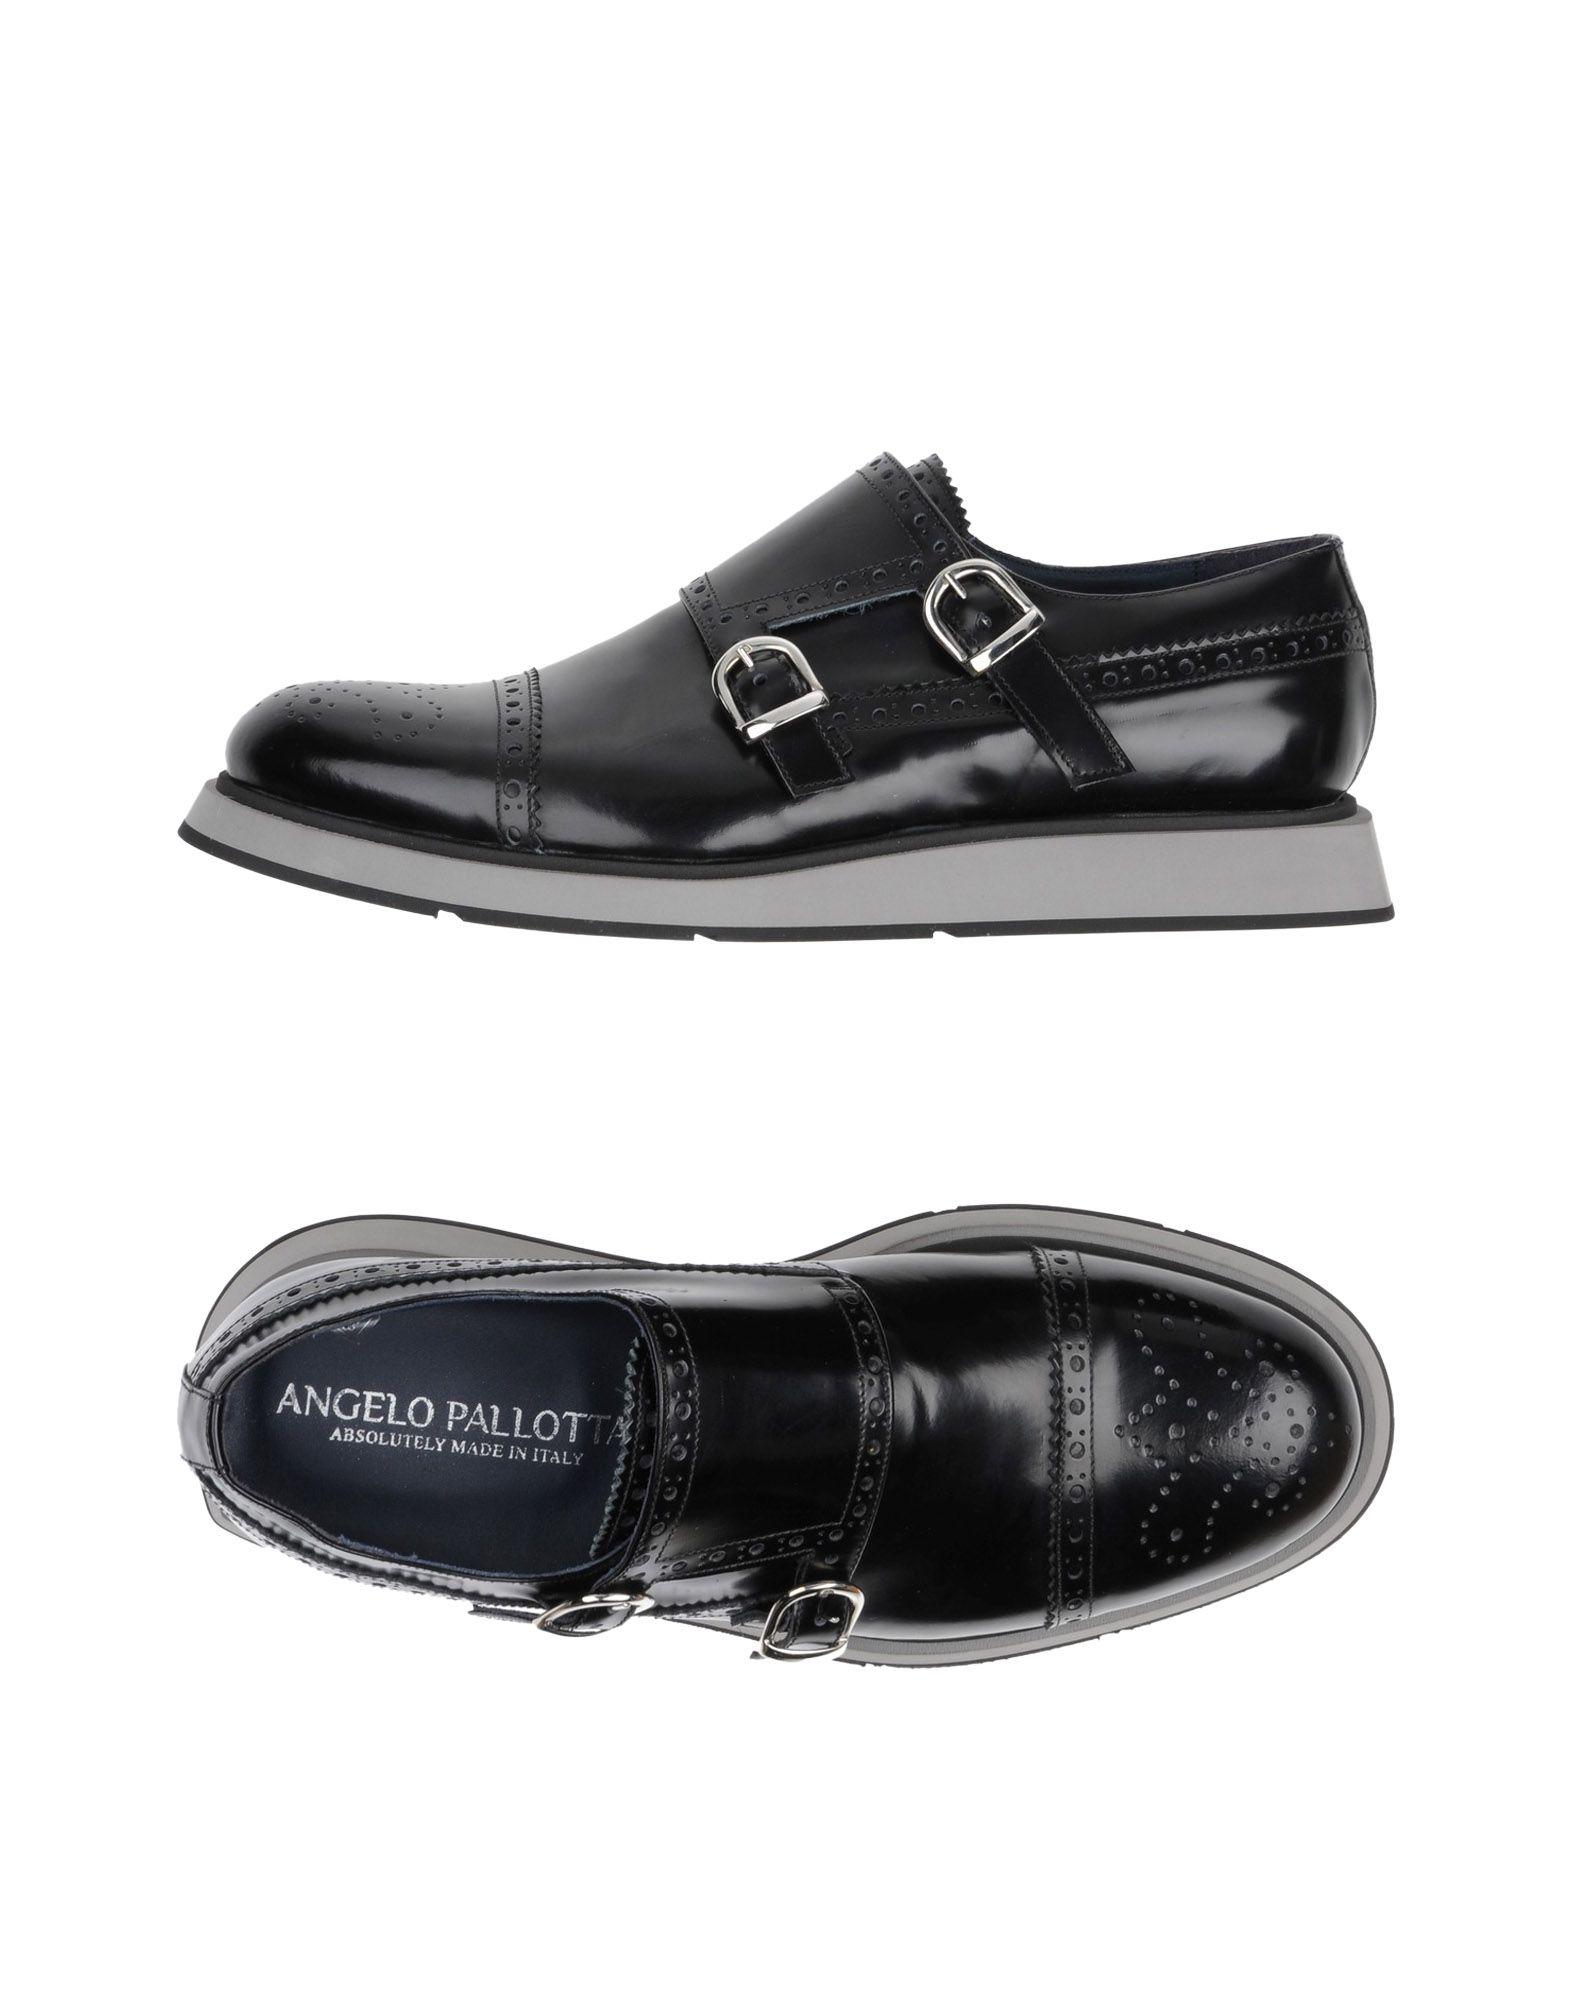 Angelo Pallotta Mokassins Herren   Herren 11243557CM Gute Qualität beliebte Schuhe a134ee